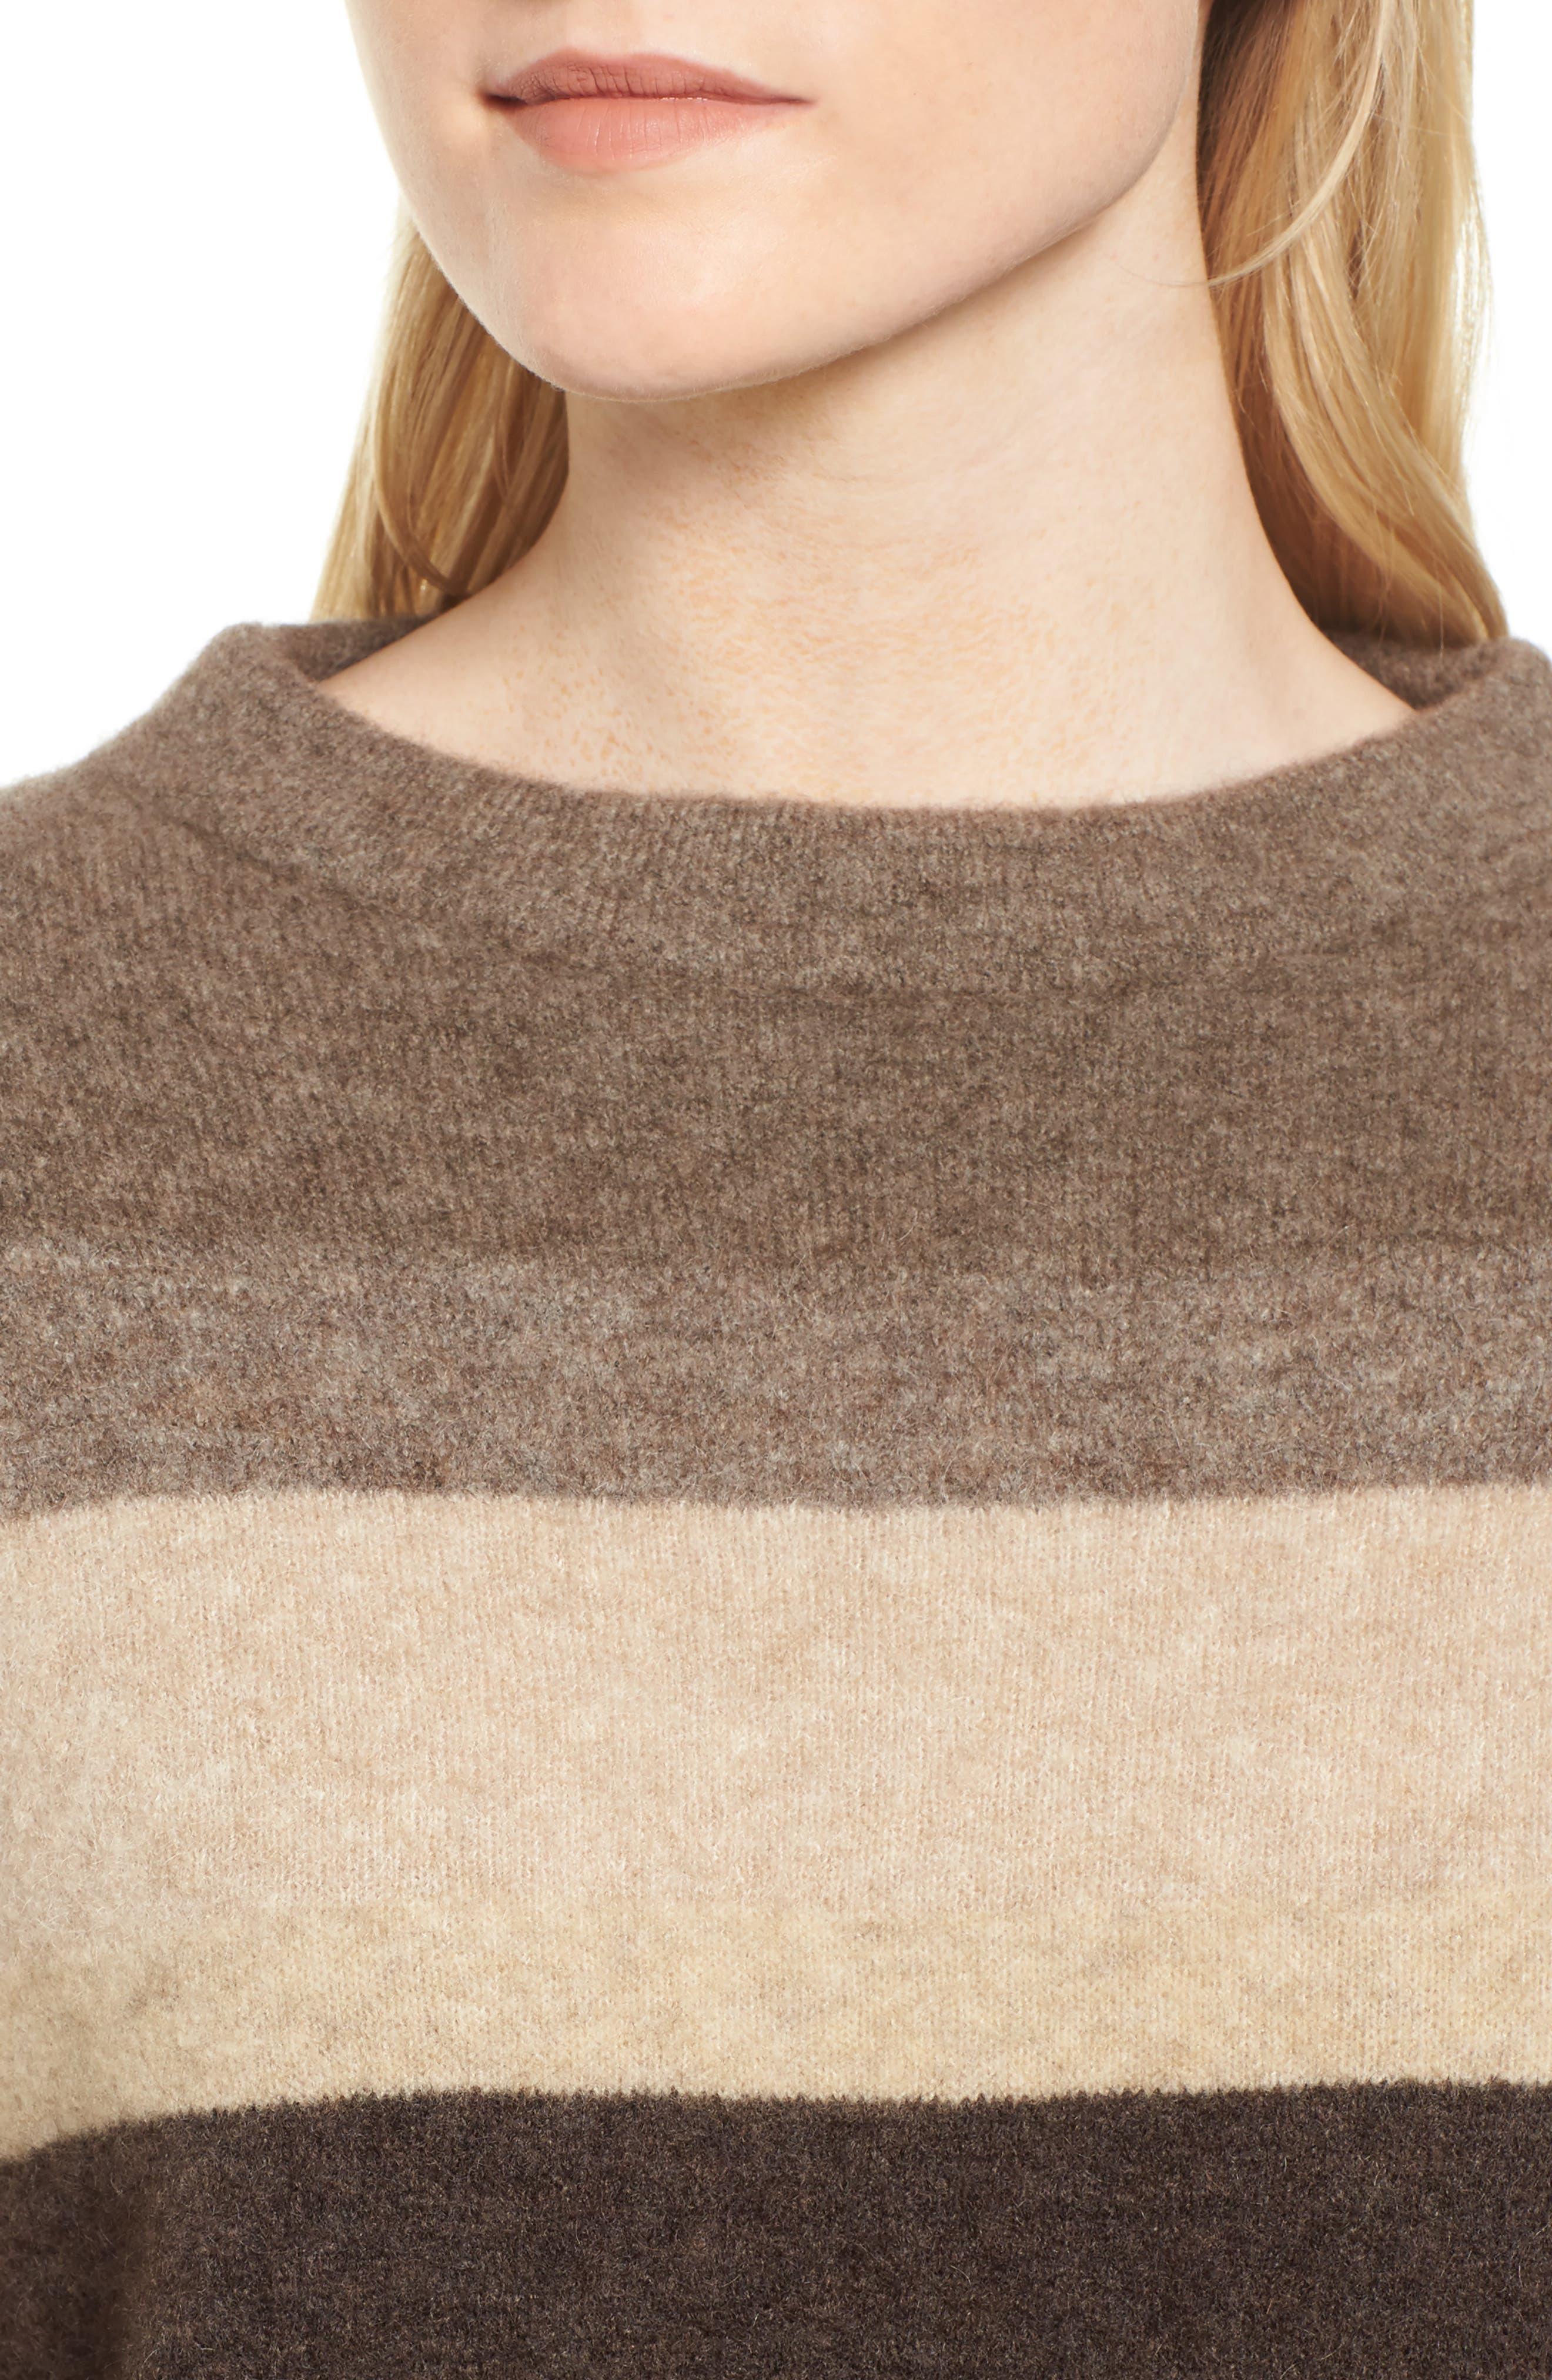 Stripe Sweater,                             Alternate thumbnail 4, color,                             Brown Multi Stripe